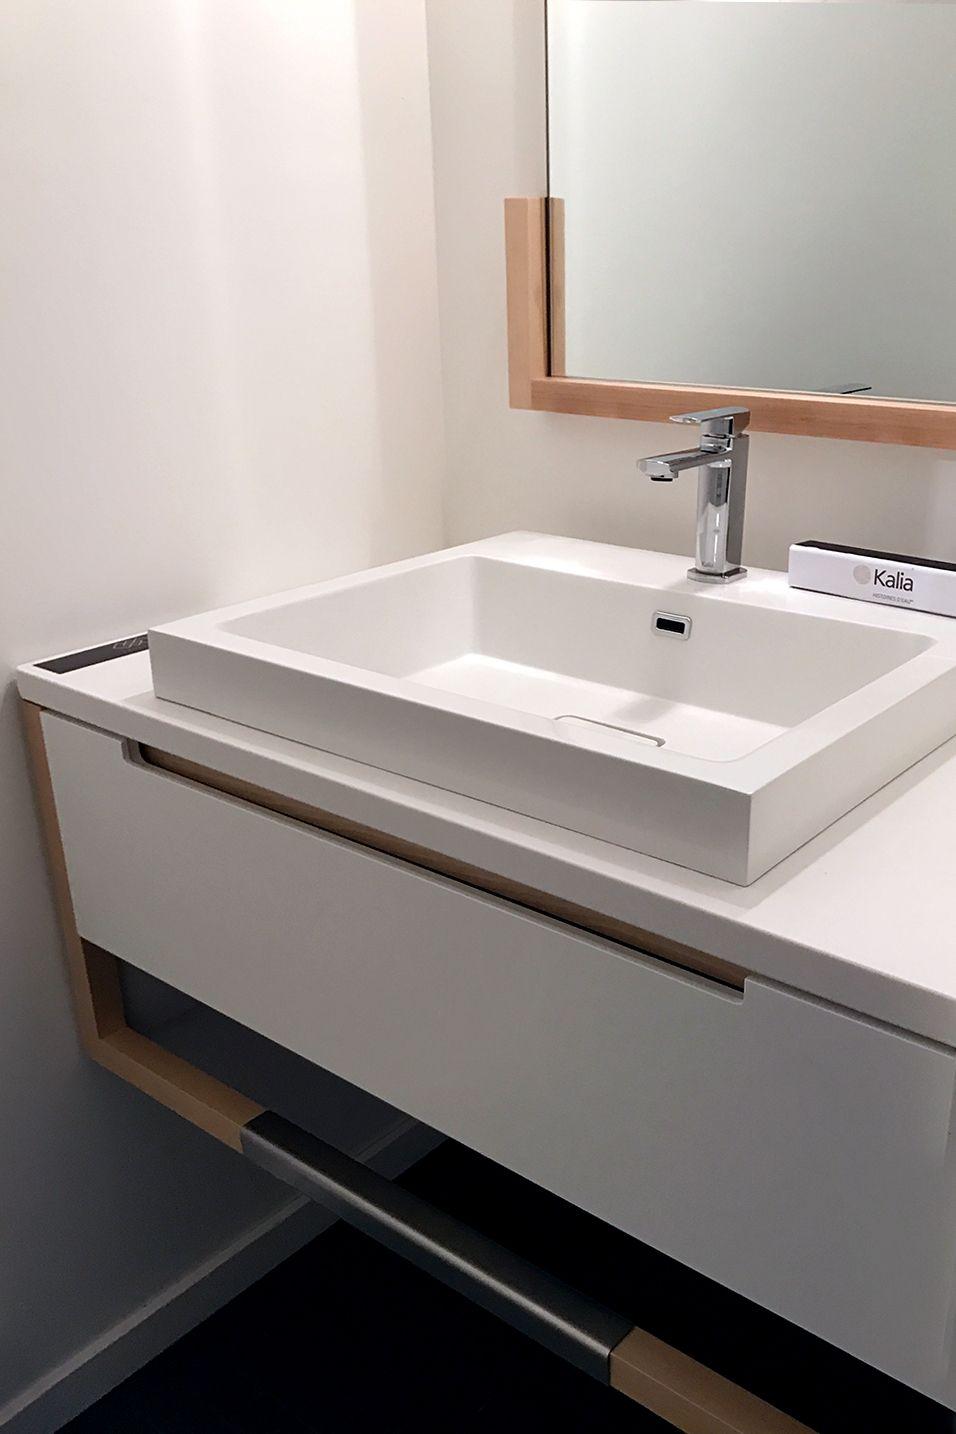 GRAFIK lavatory faucet and JOKI lavatory in the Thinking Habitat ...